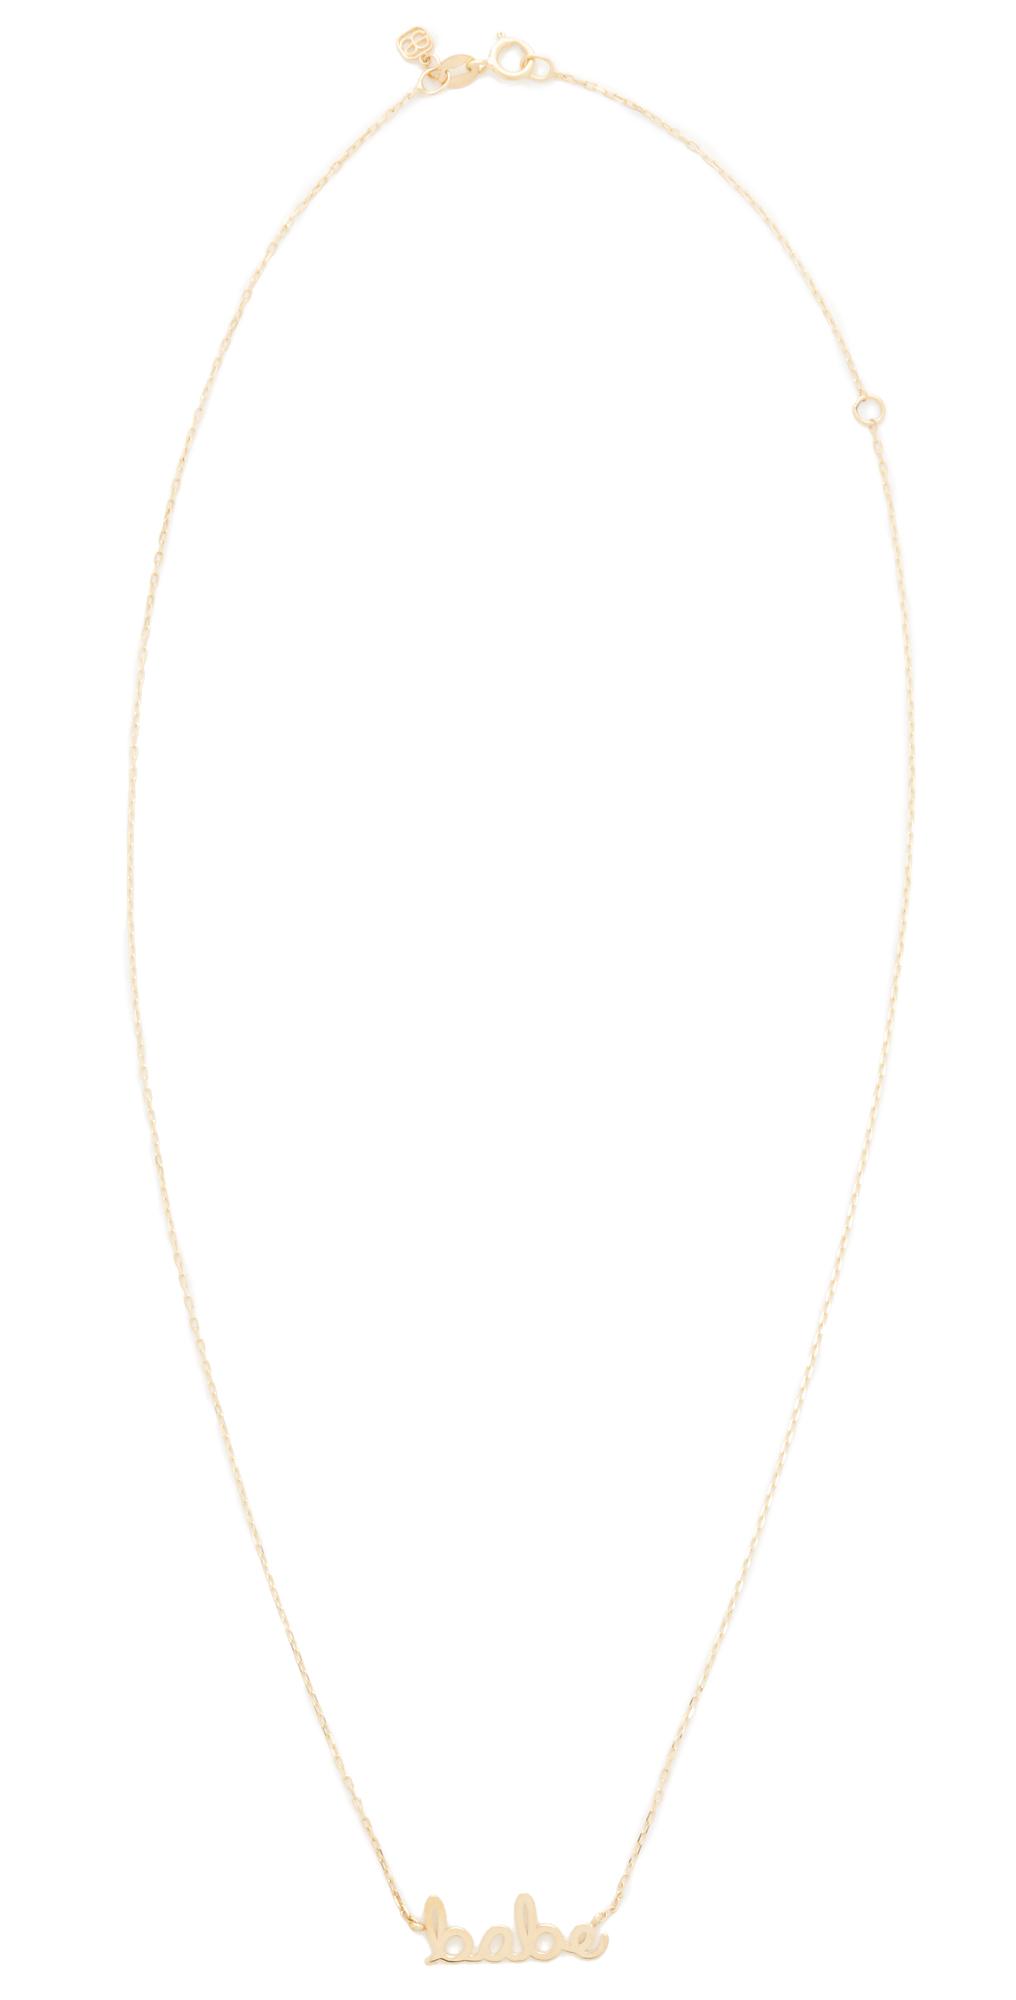 Sydney Evan 14k Gold Small Babe Necklace